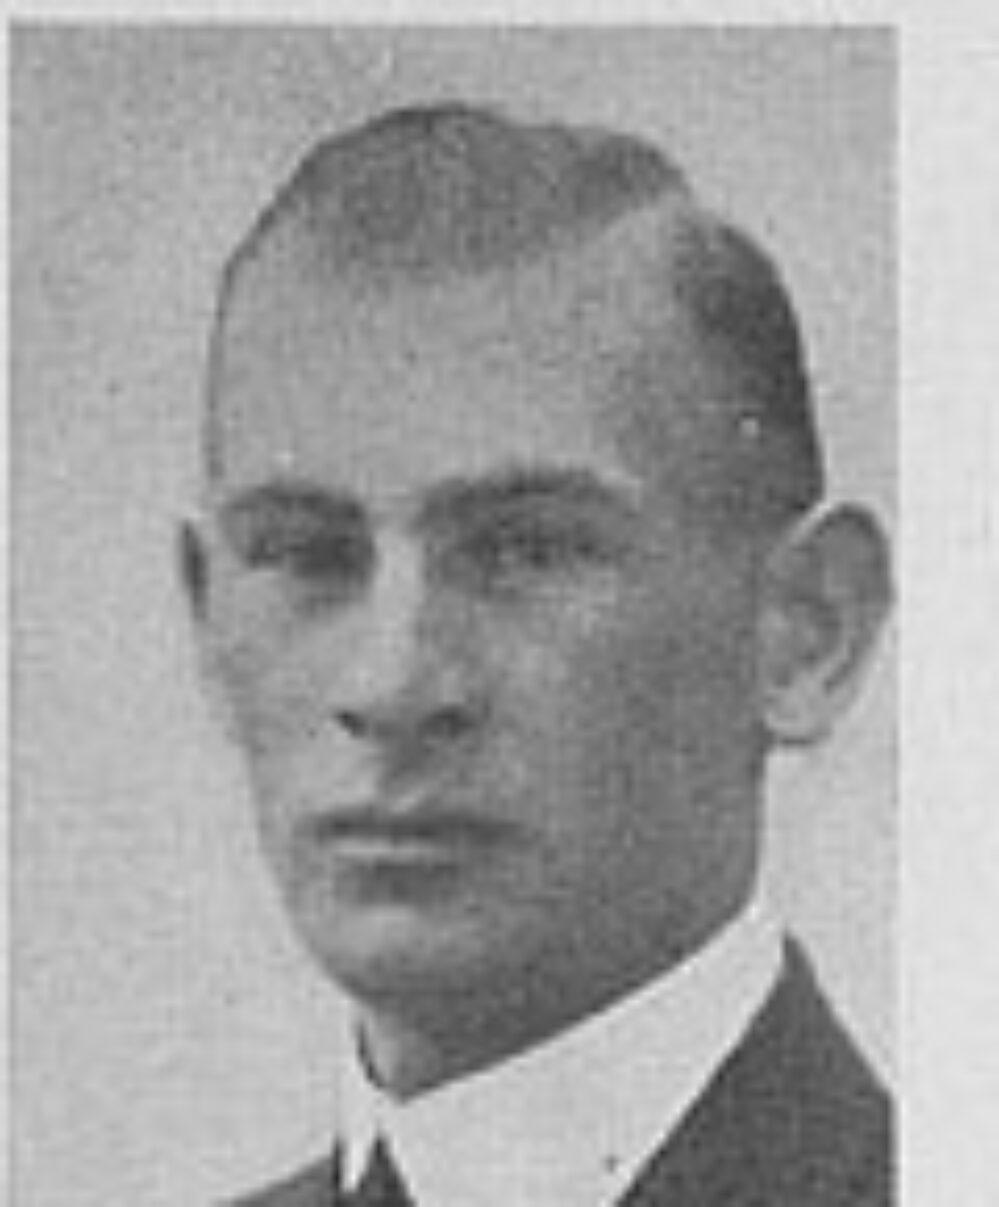 Sverre Langfeldt